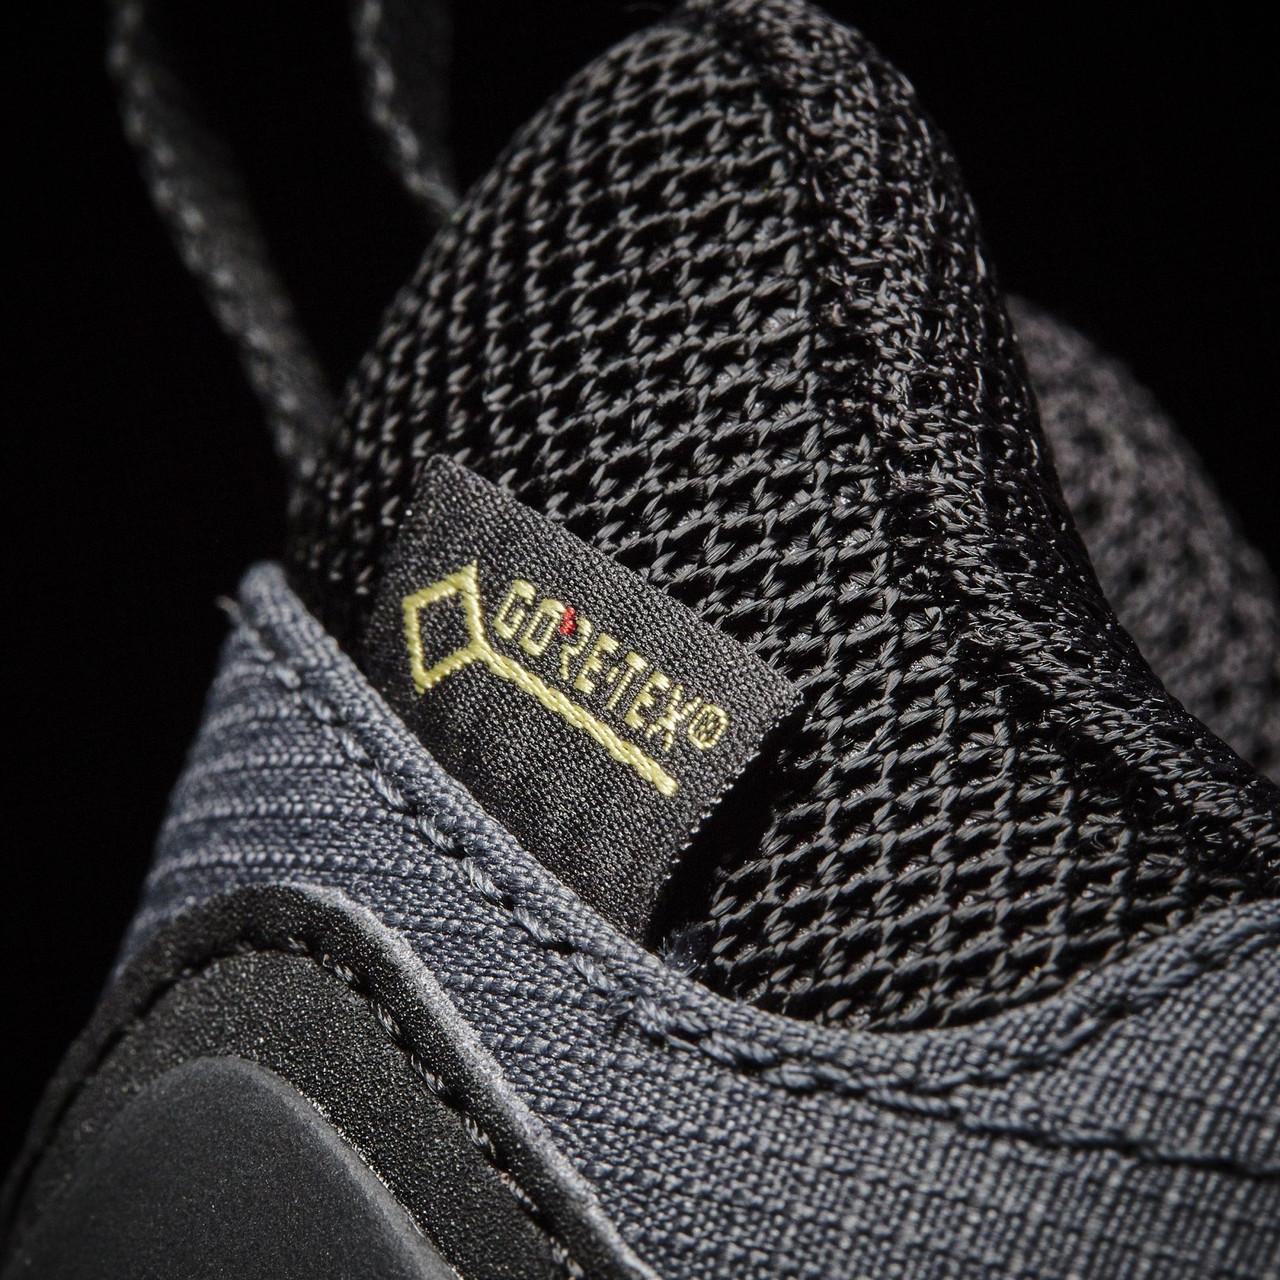 cbf1b3ffd8ef ... Мужские кроссовки Adidas Performance Terrex Swift R GTX (Артикул   BB4625), фото 8